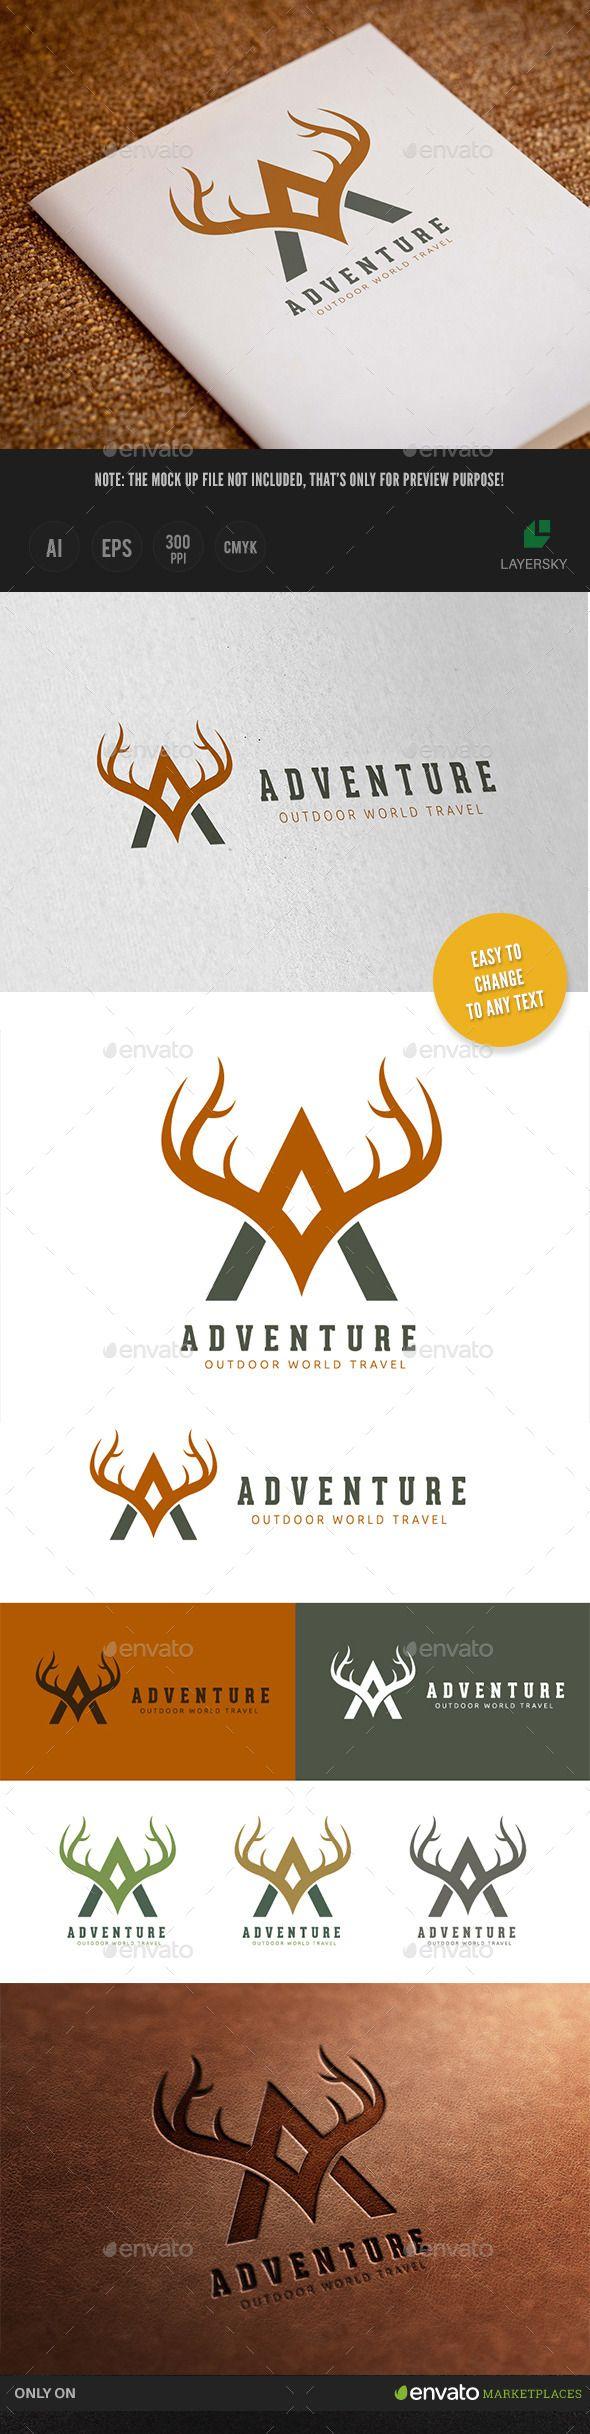 Outdoor Adventures Logo — Vector EPS #team #deer • Available here → https://graphicriver.net/item/outdoor-adventures-logo/11765458?ref=pxcr